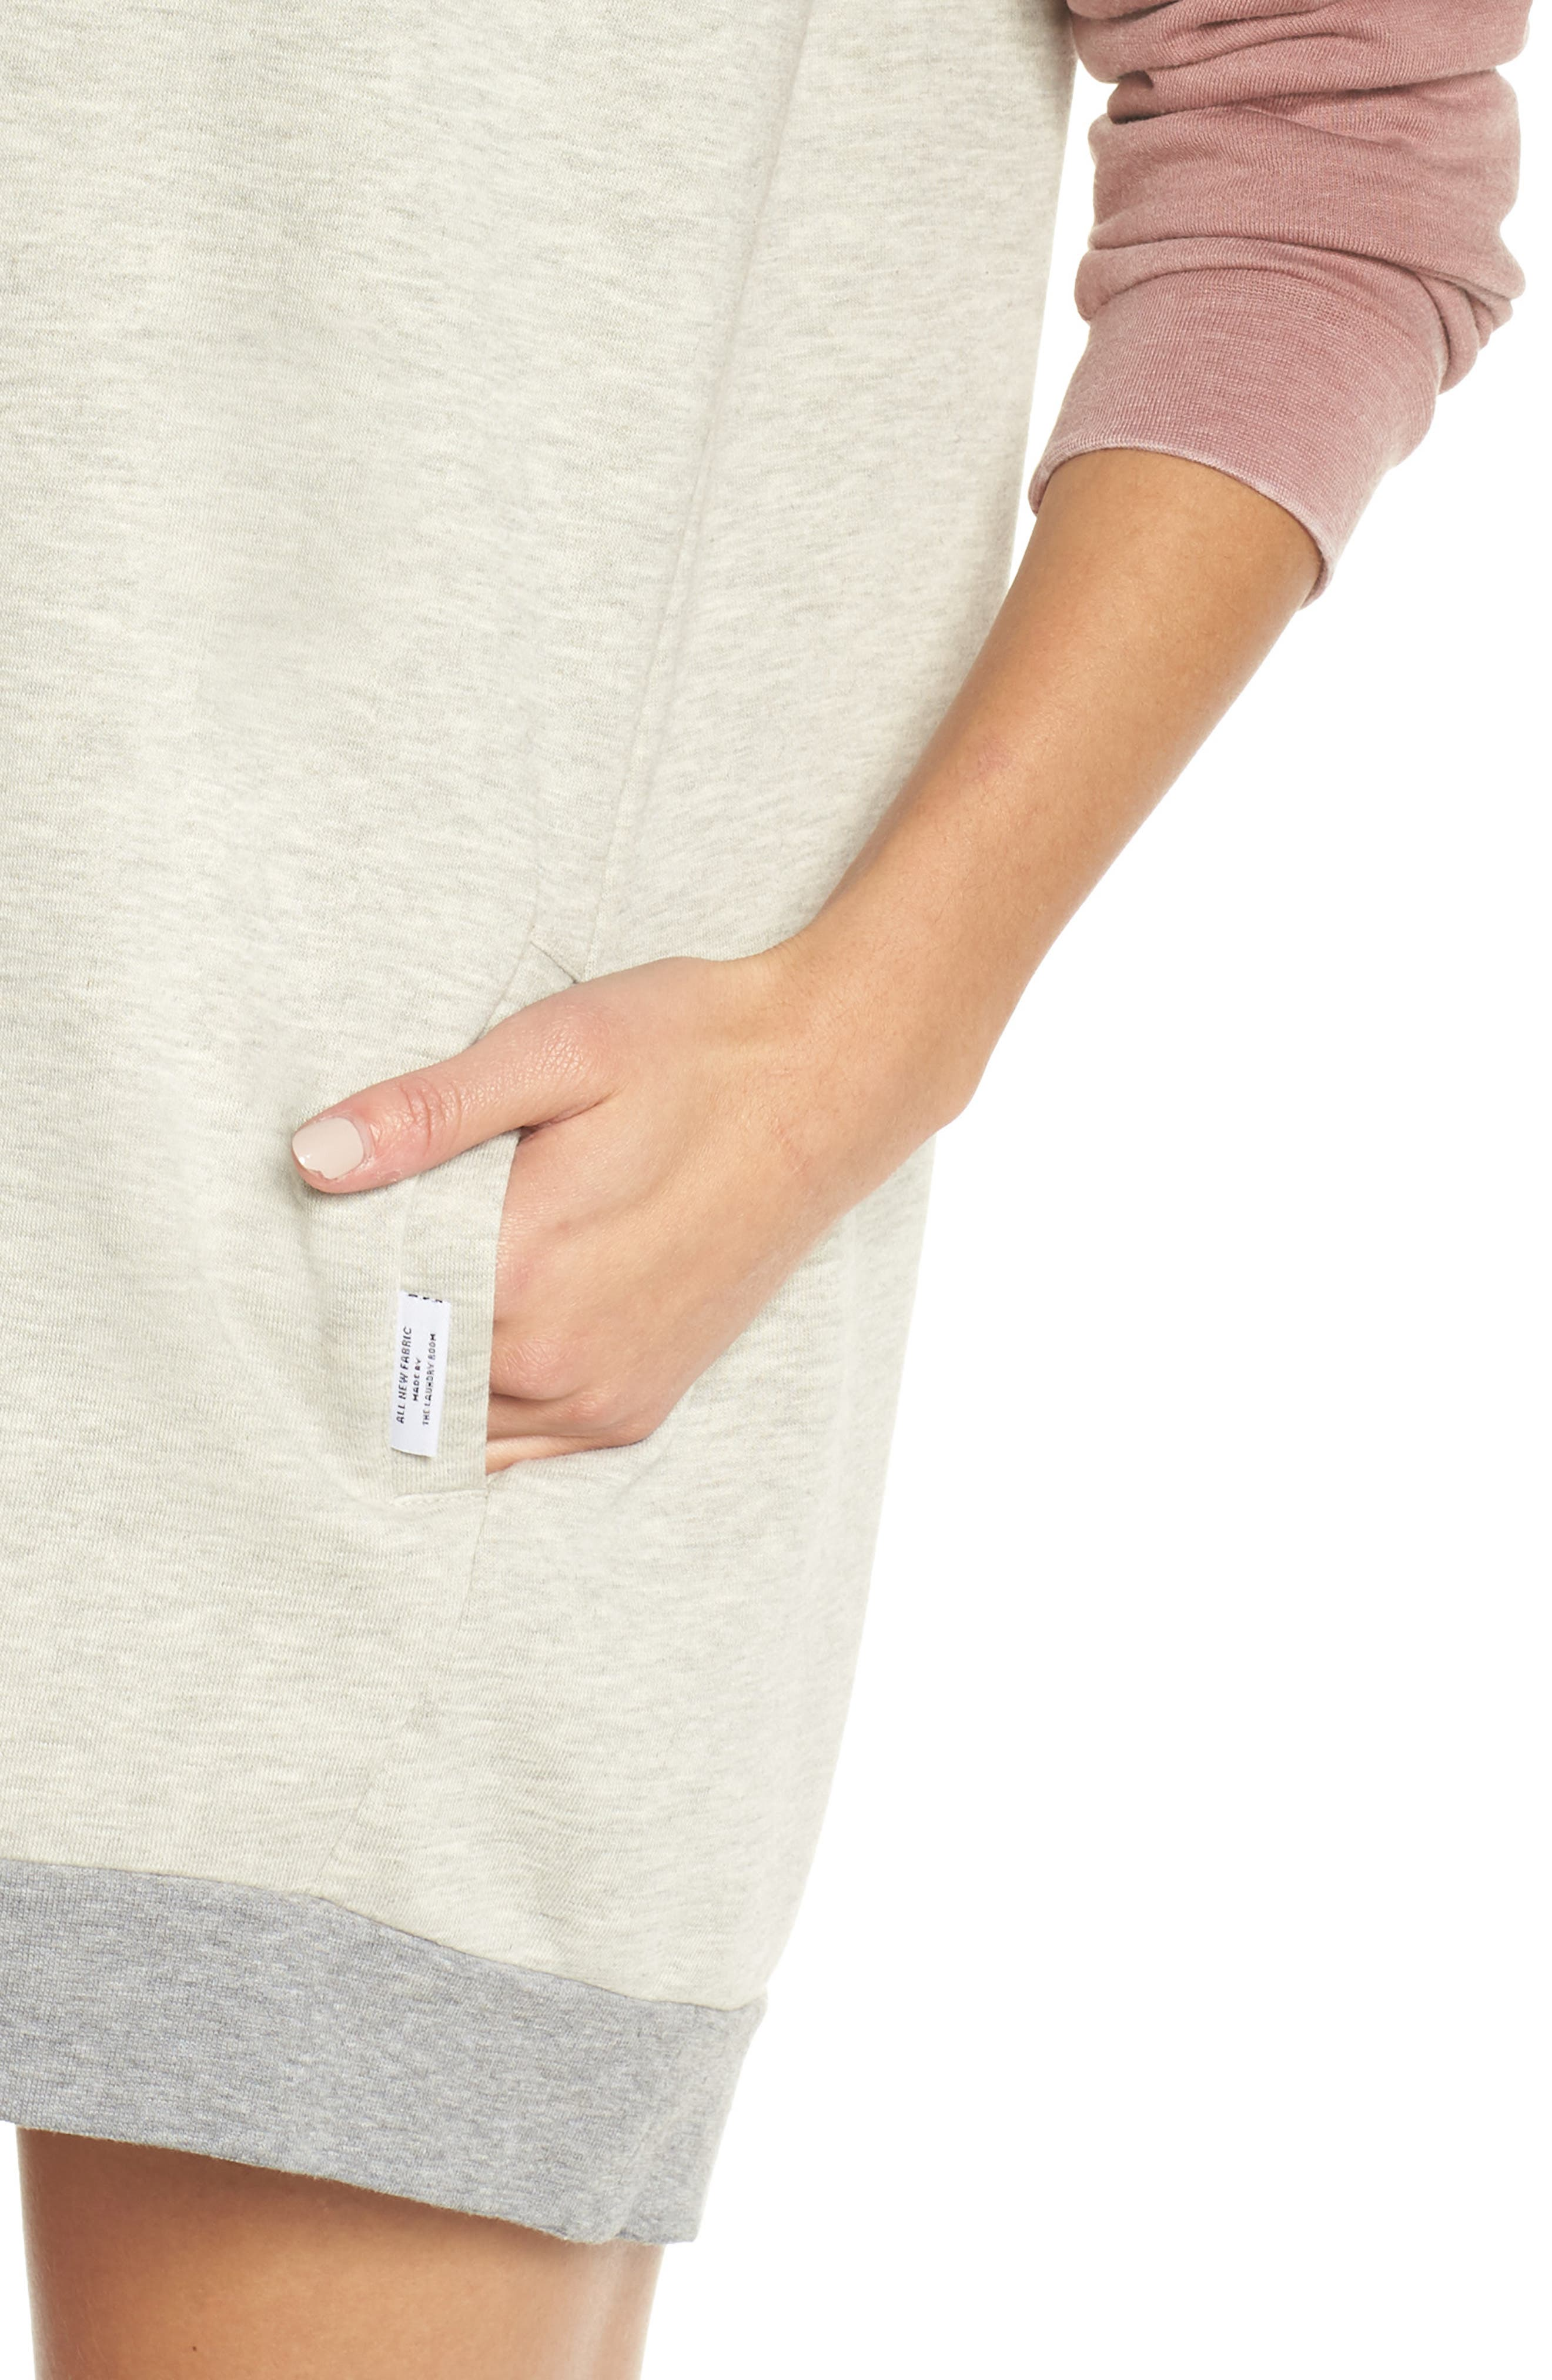 Lounge Sweatshirt Dress,                             Alternate thumbnail 4, color,                             PEBBLE HEATHER / MAUVE